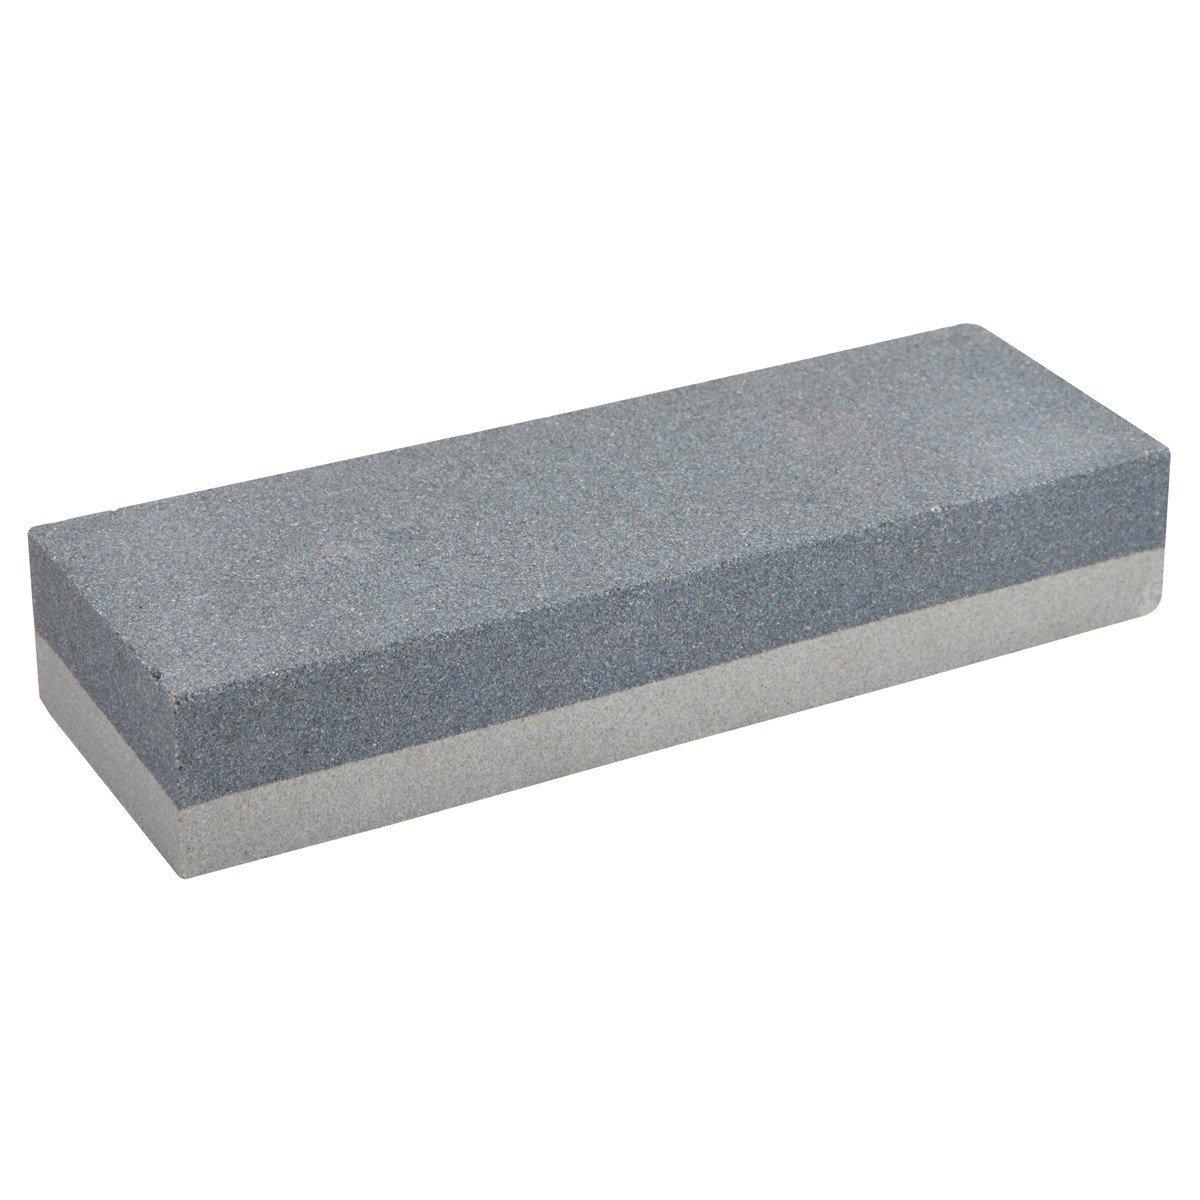 appoutga-sharpening-stone